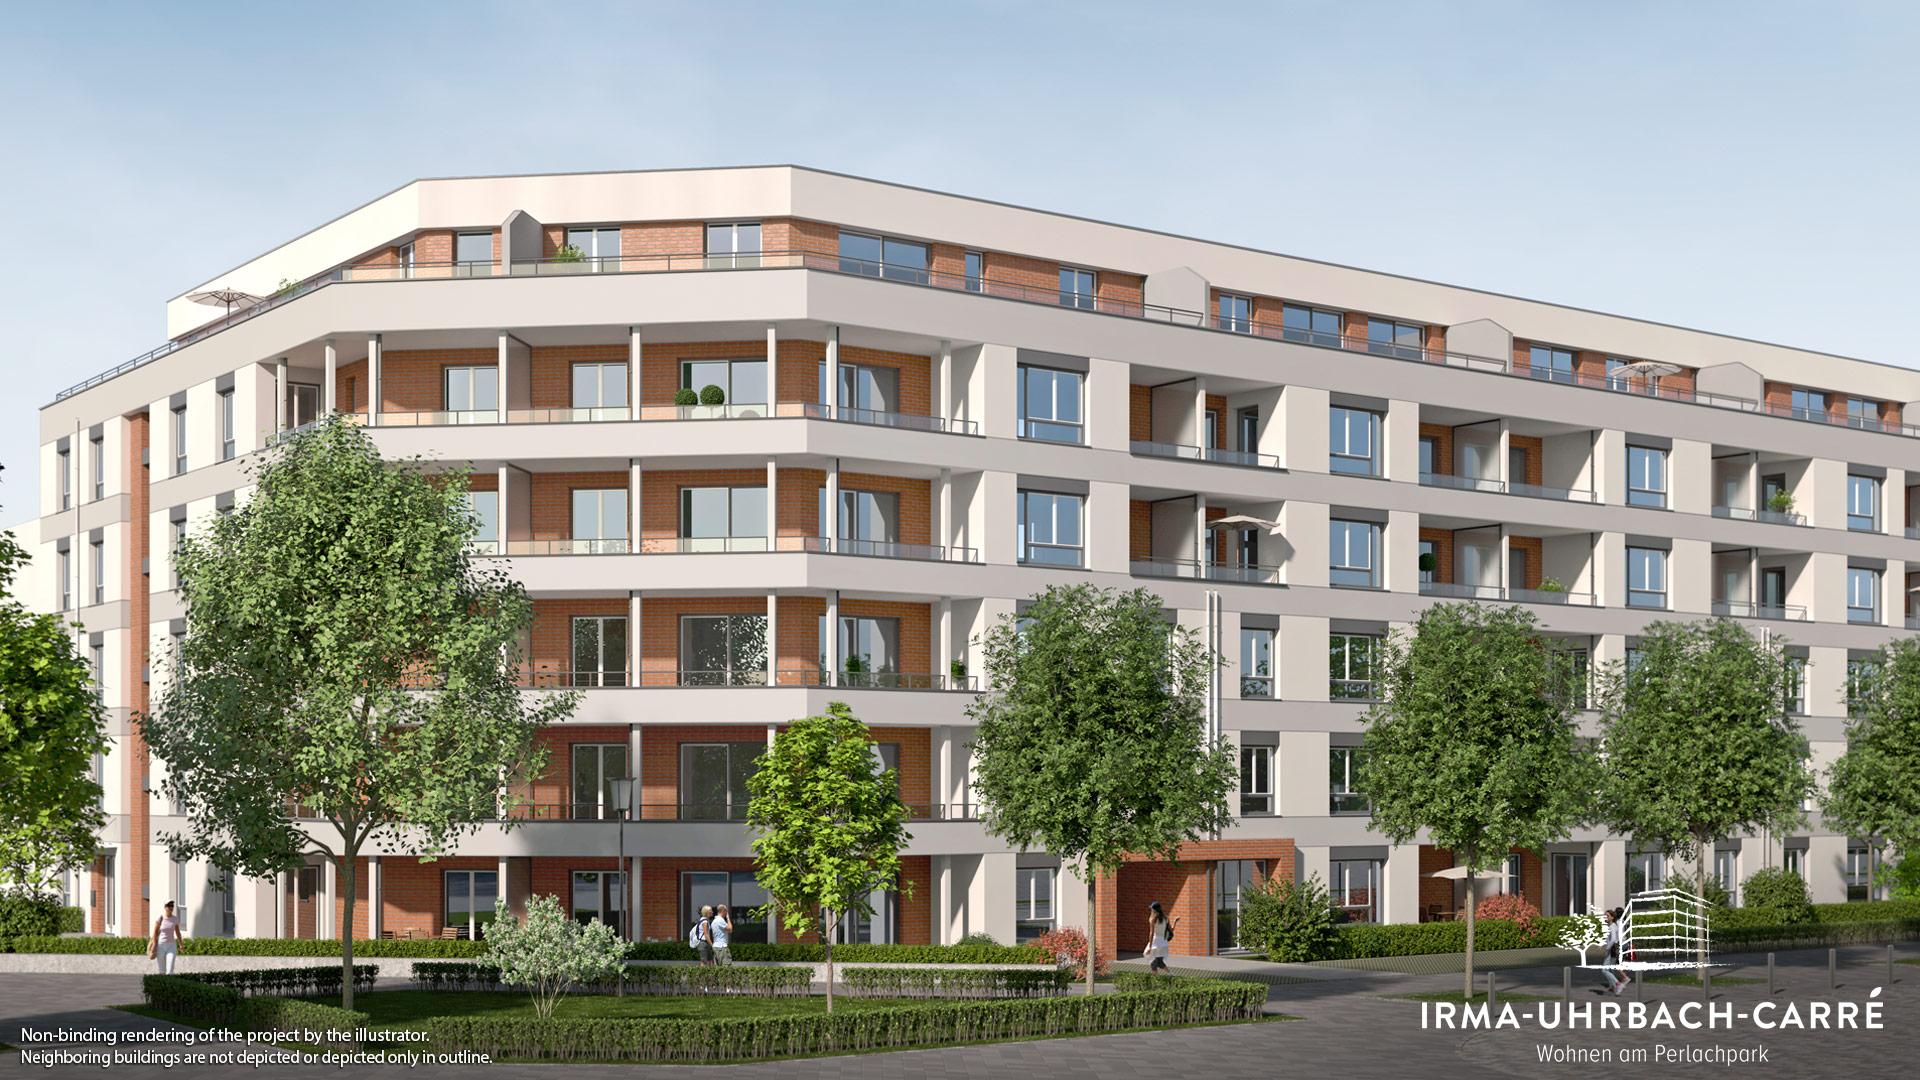 Property Irma-Uhrbach-Carr - Illustration 1